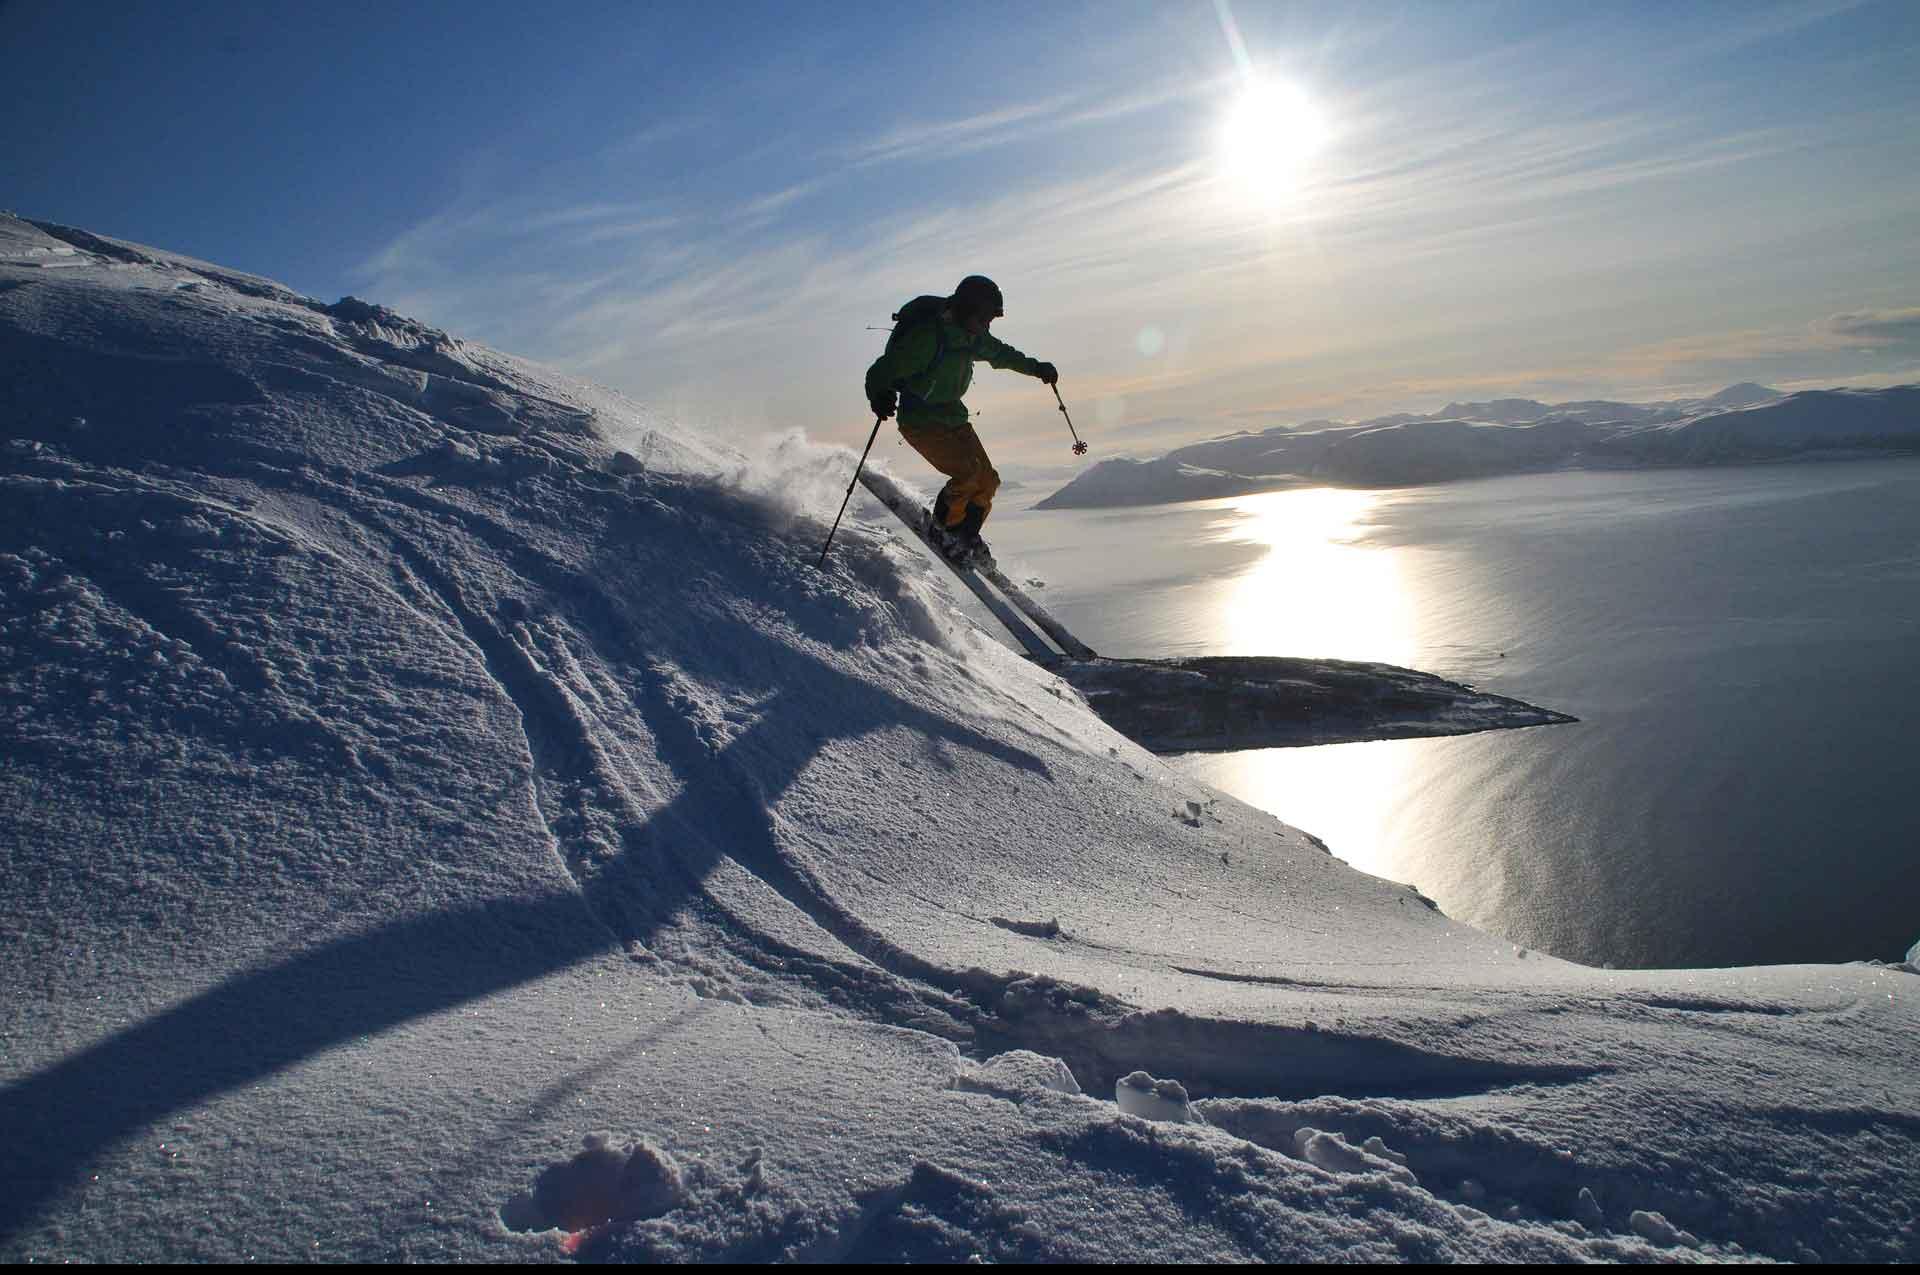 Mostra, Neve, Ghiaccio, Asiago, Schnee- und, Eisausstellung, Expo Neige, Glace, Exposición Nieve, Hielo, Ice, Snow